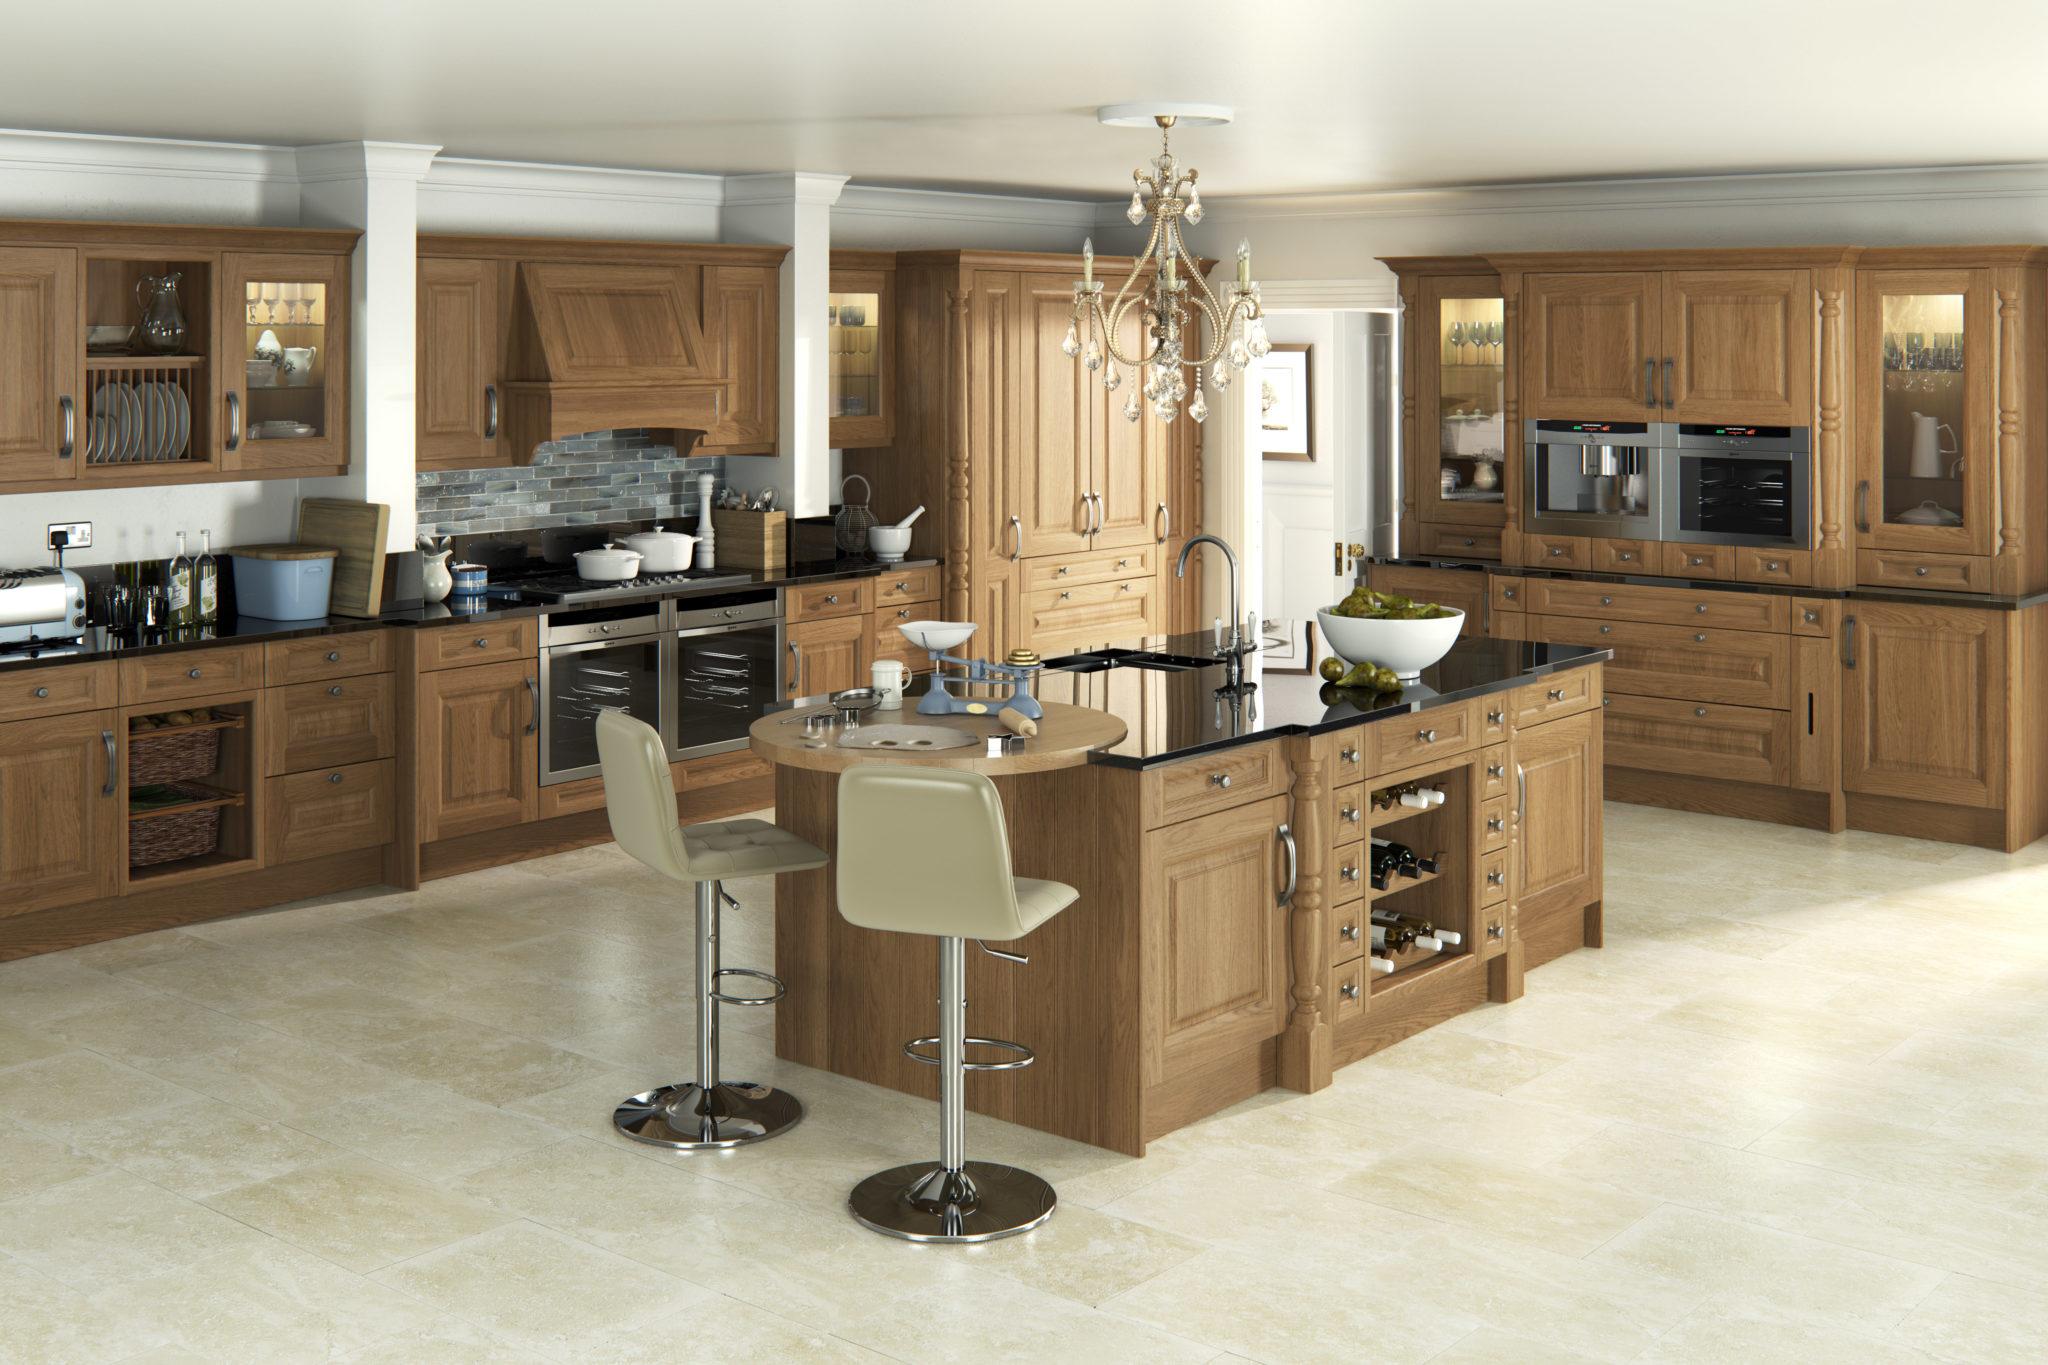 traditional kitchen design - oak kitchens - traditional ... on Traditional Kitchen Decor  id=66196